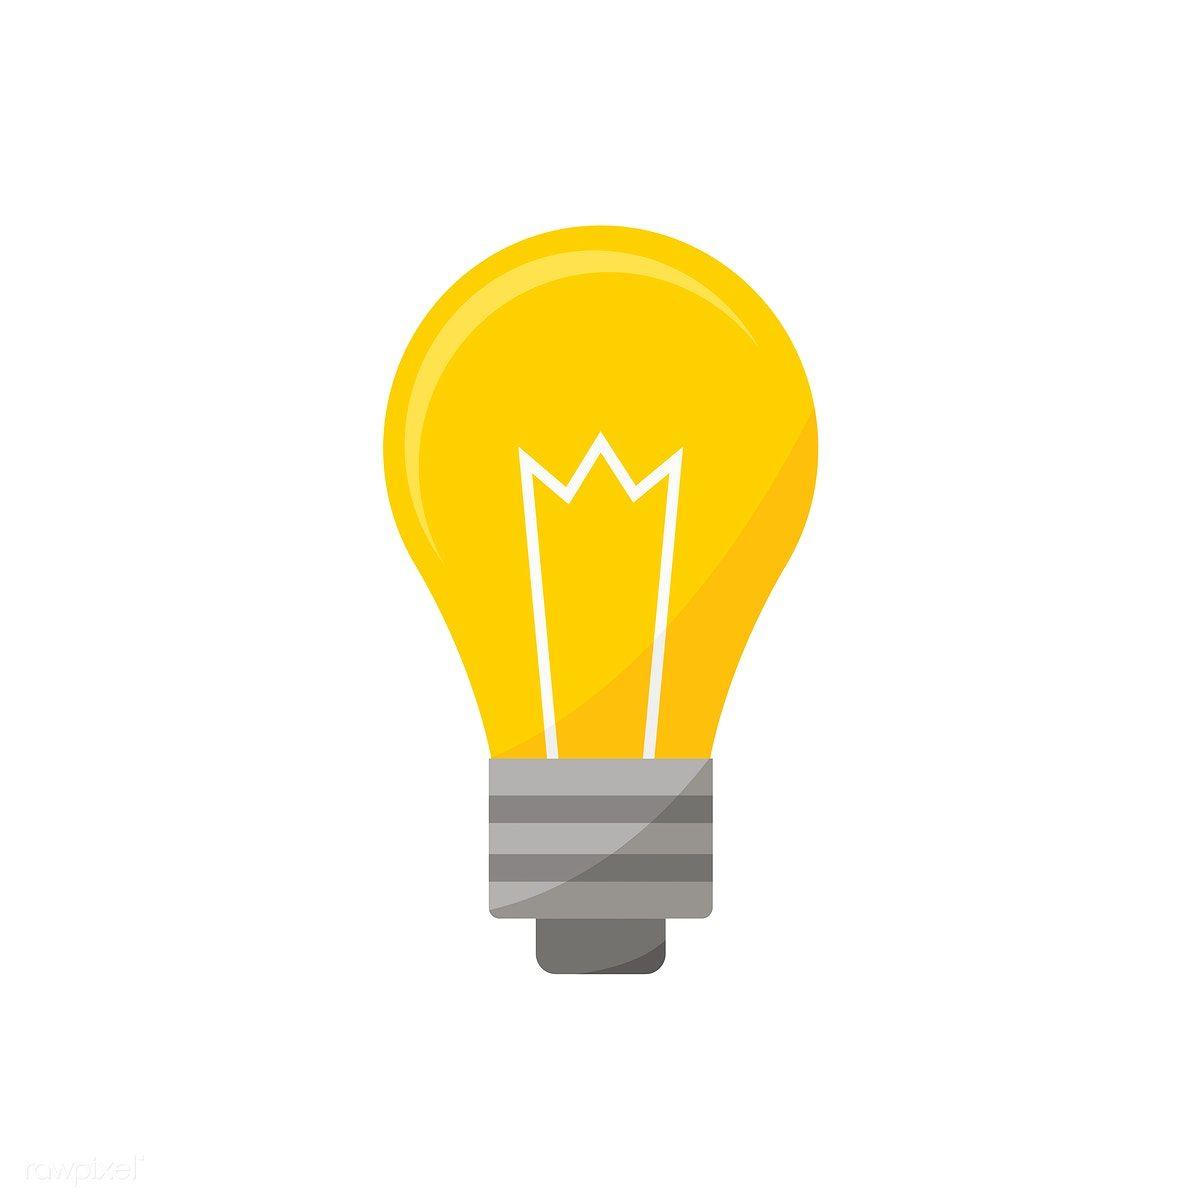 Light Bulb Icon Graphic Illustration Free Image By Rawpixel Com Light Bulb Icon Graphic Illustration Illustration